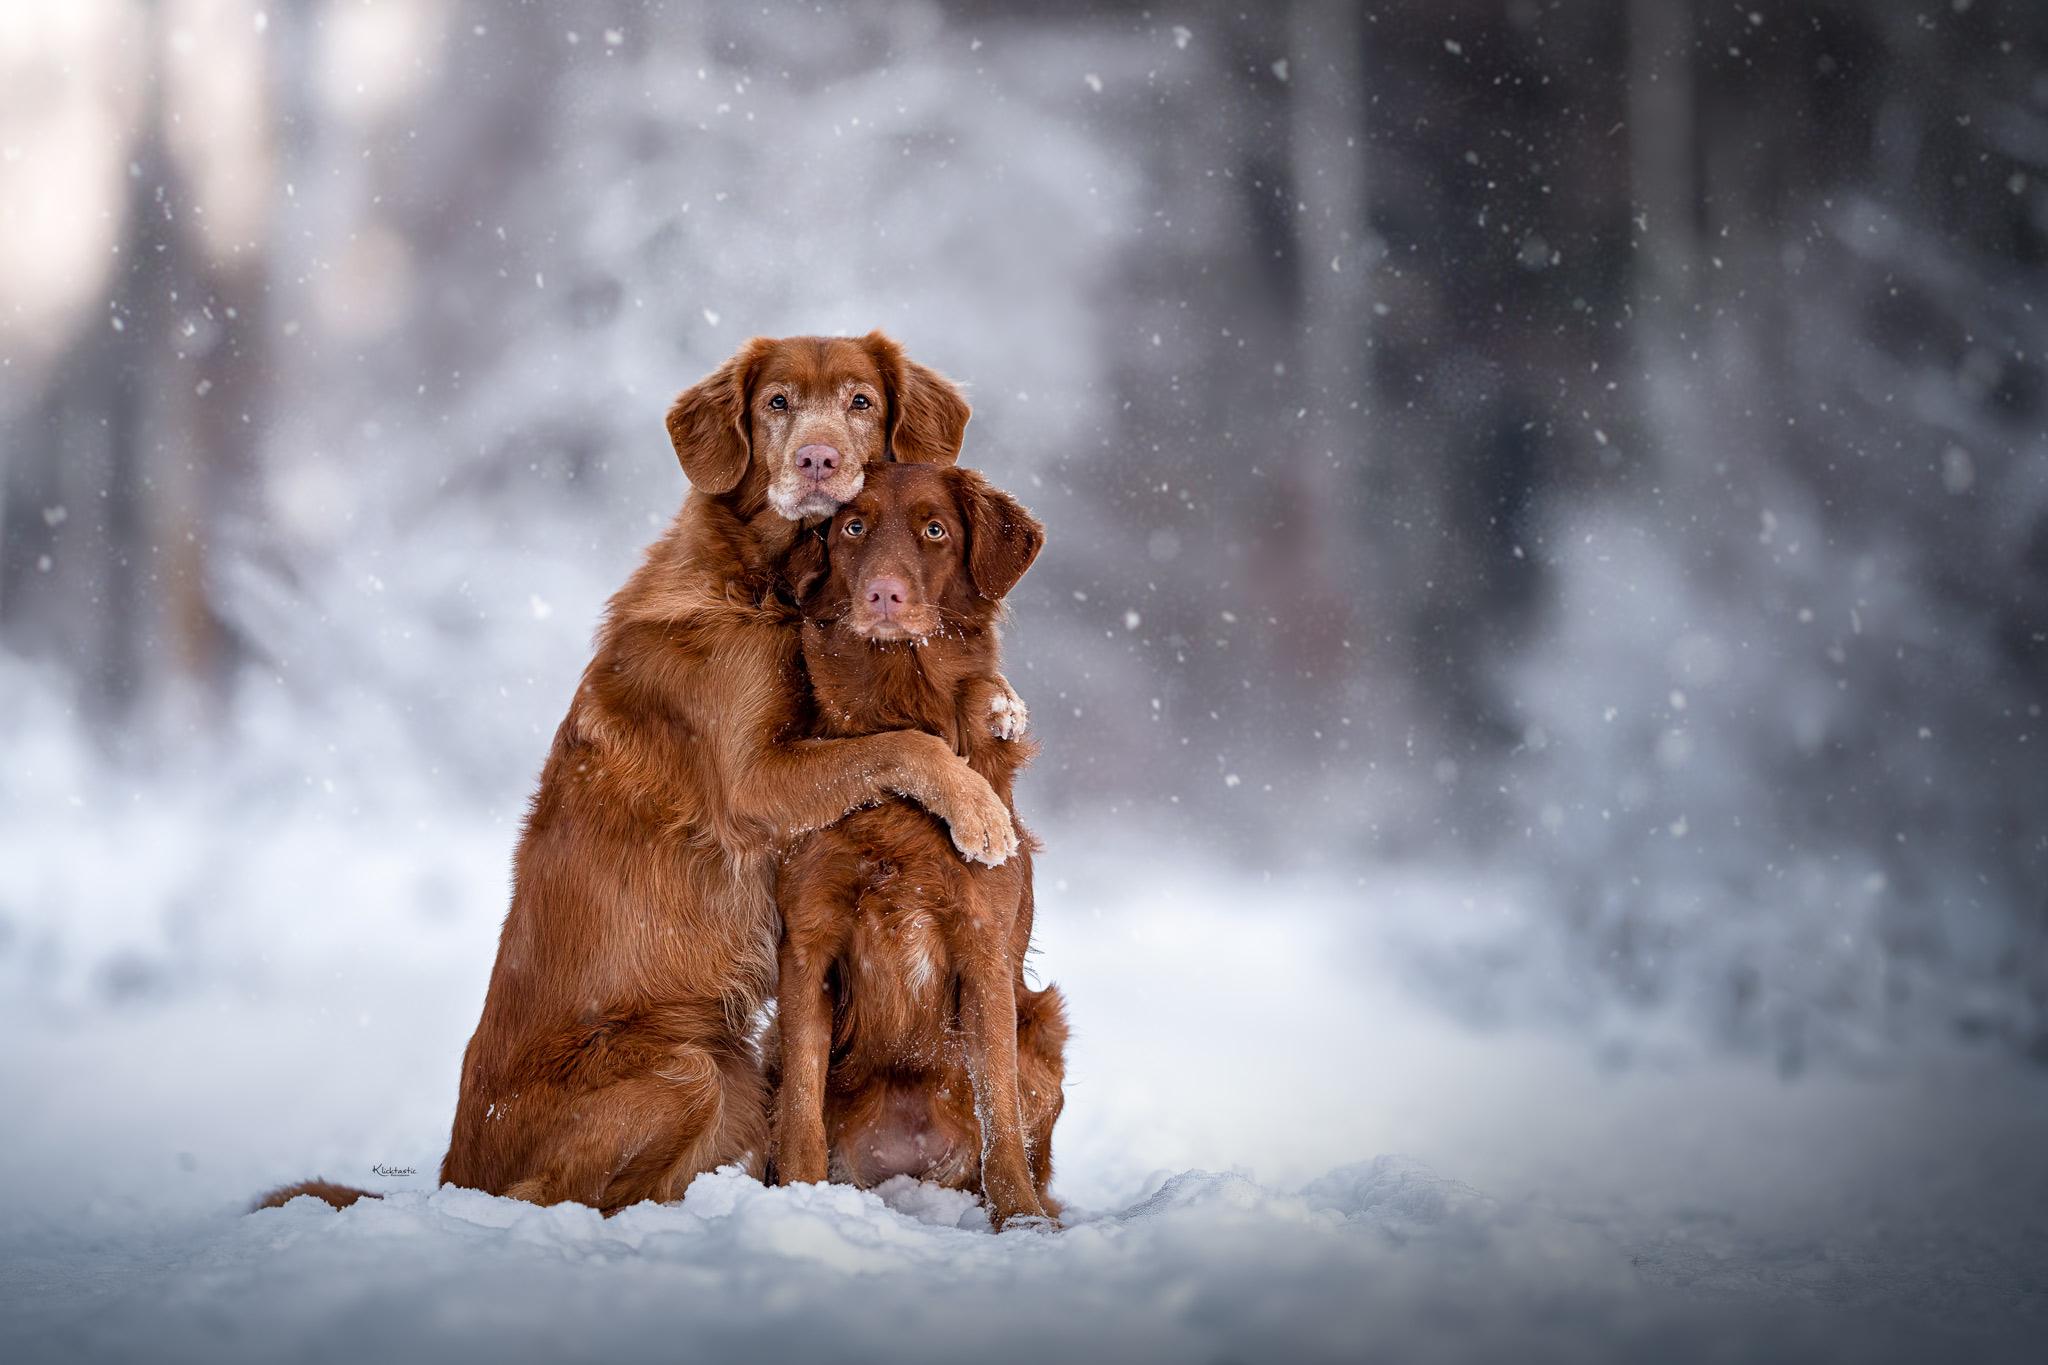 Zwei Nova Scotia Toller Retriever umarmen sich im Schnee